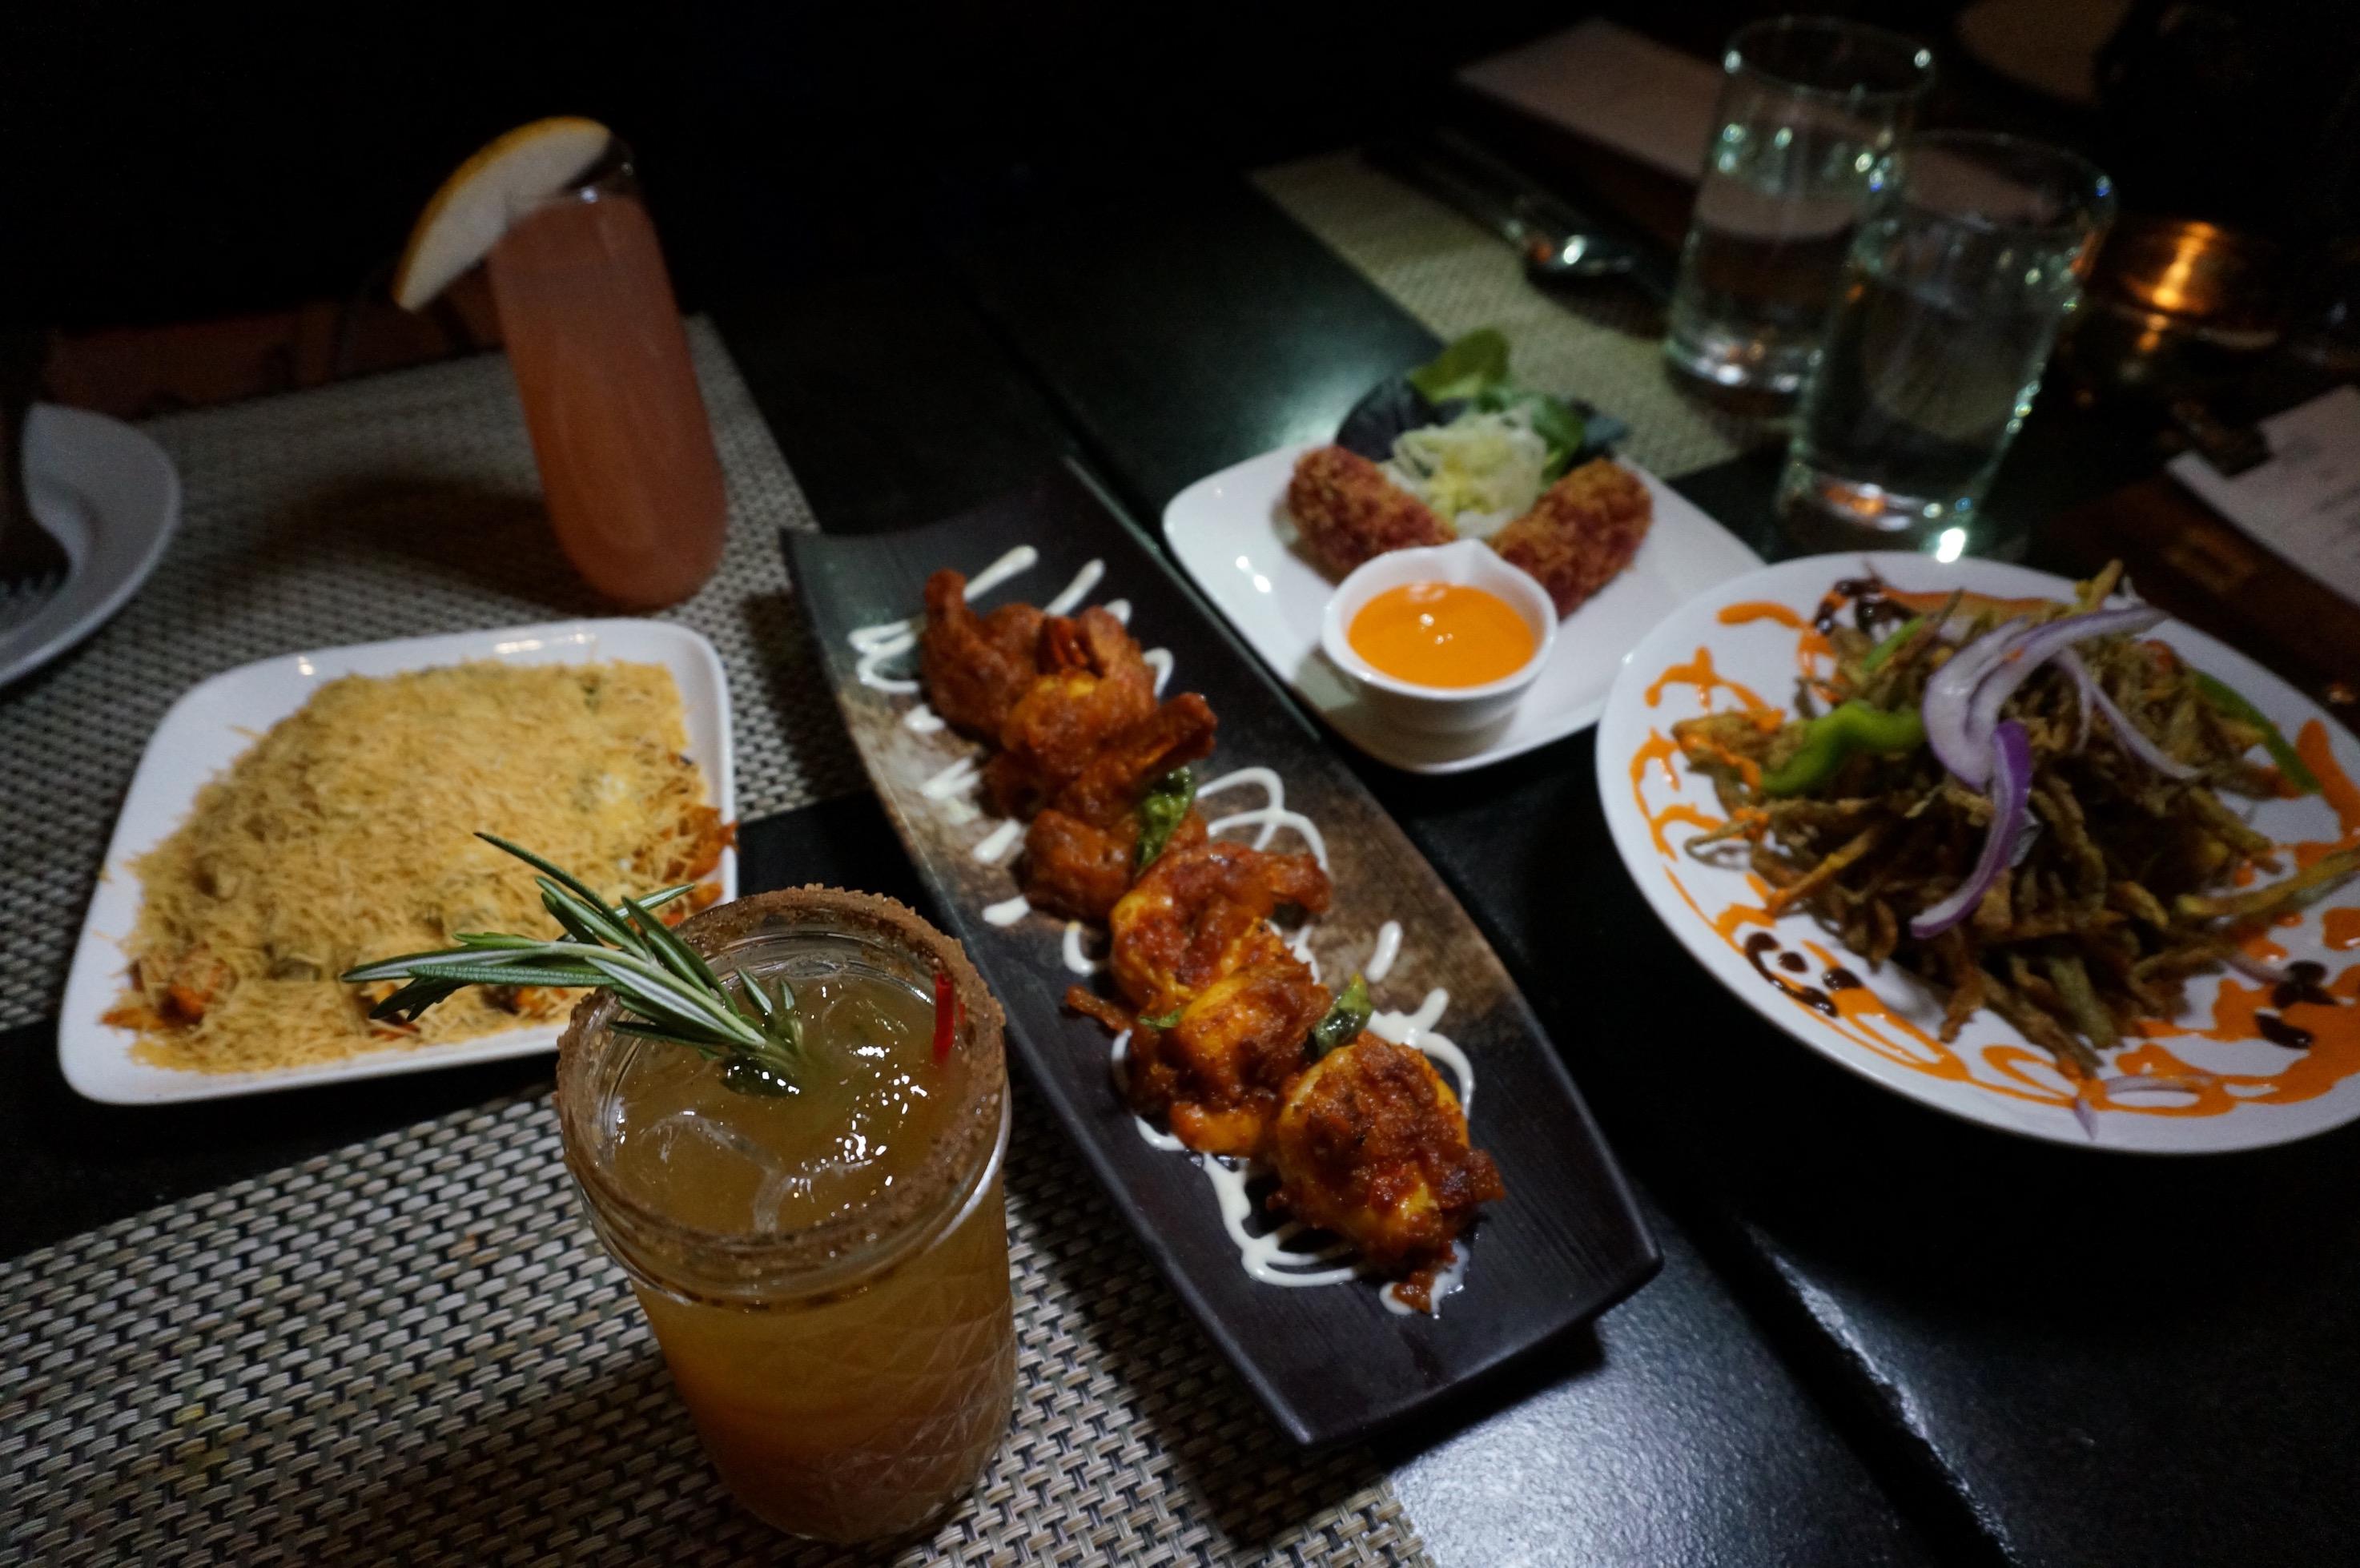 Imli Indian Restaurant: A Standout Date Spot on the Upper East ...